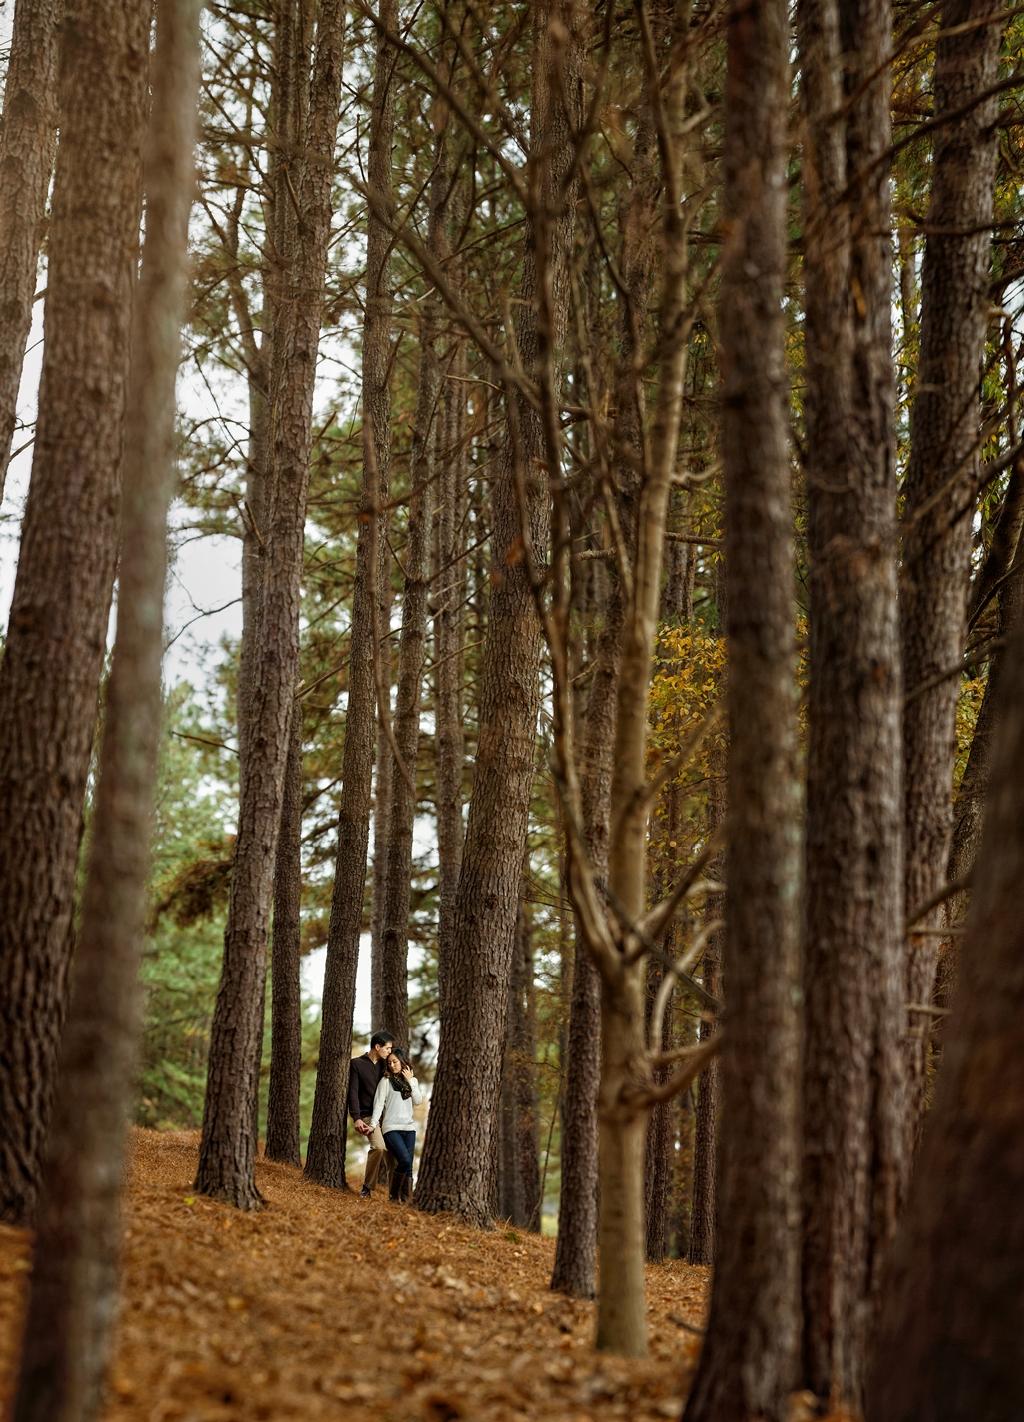 Trees Pano copy.jpg